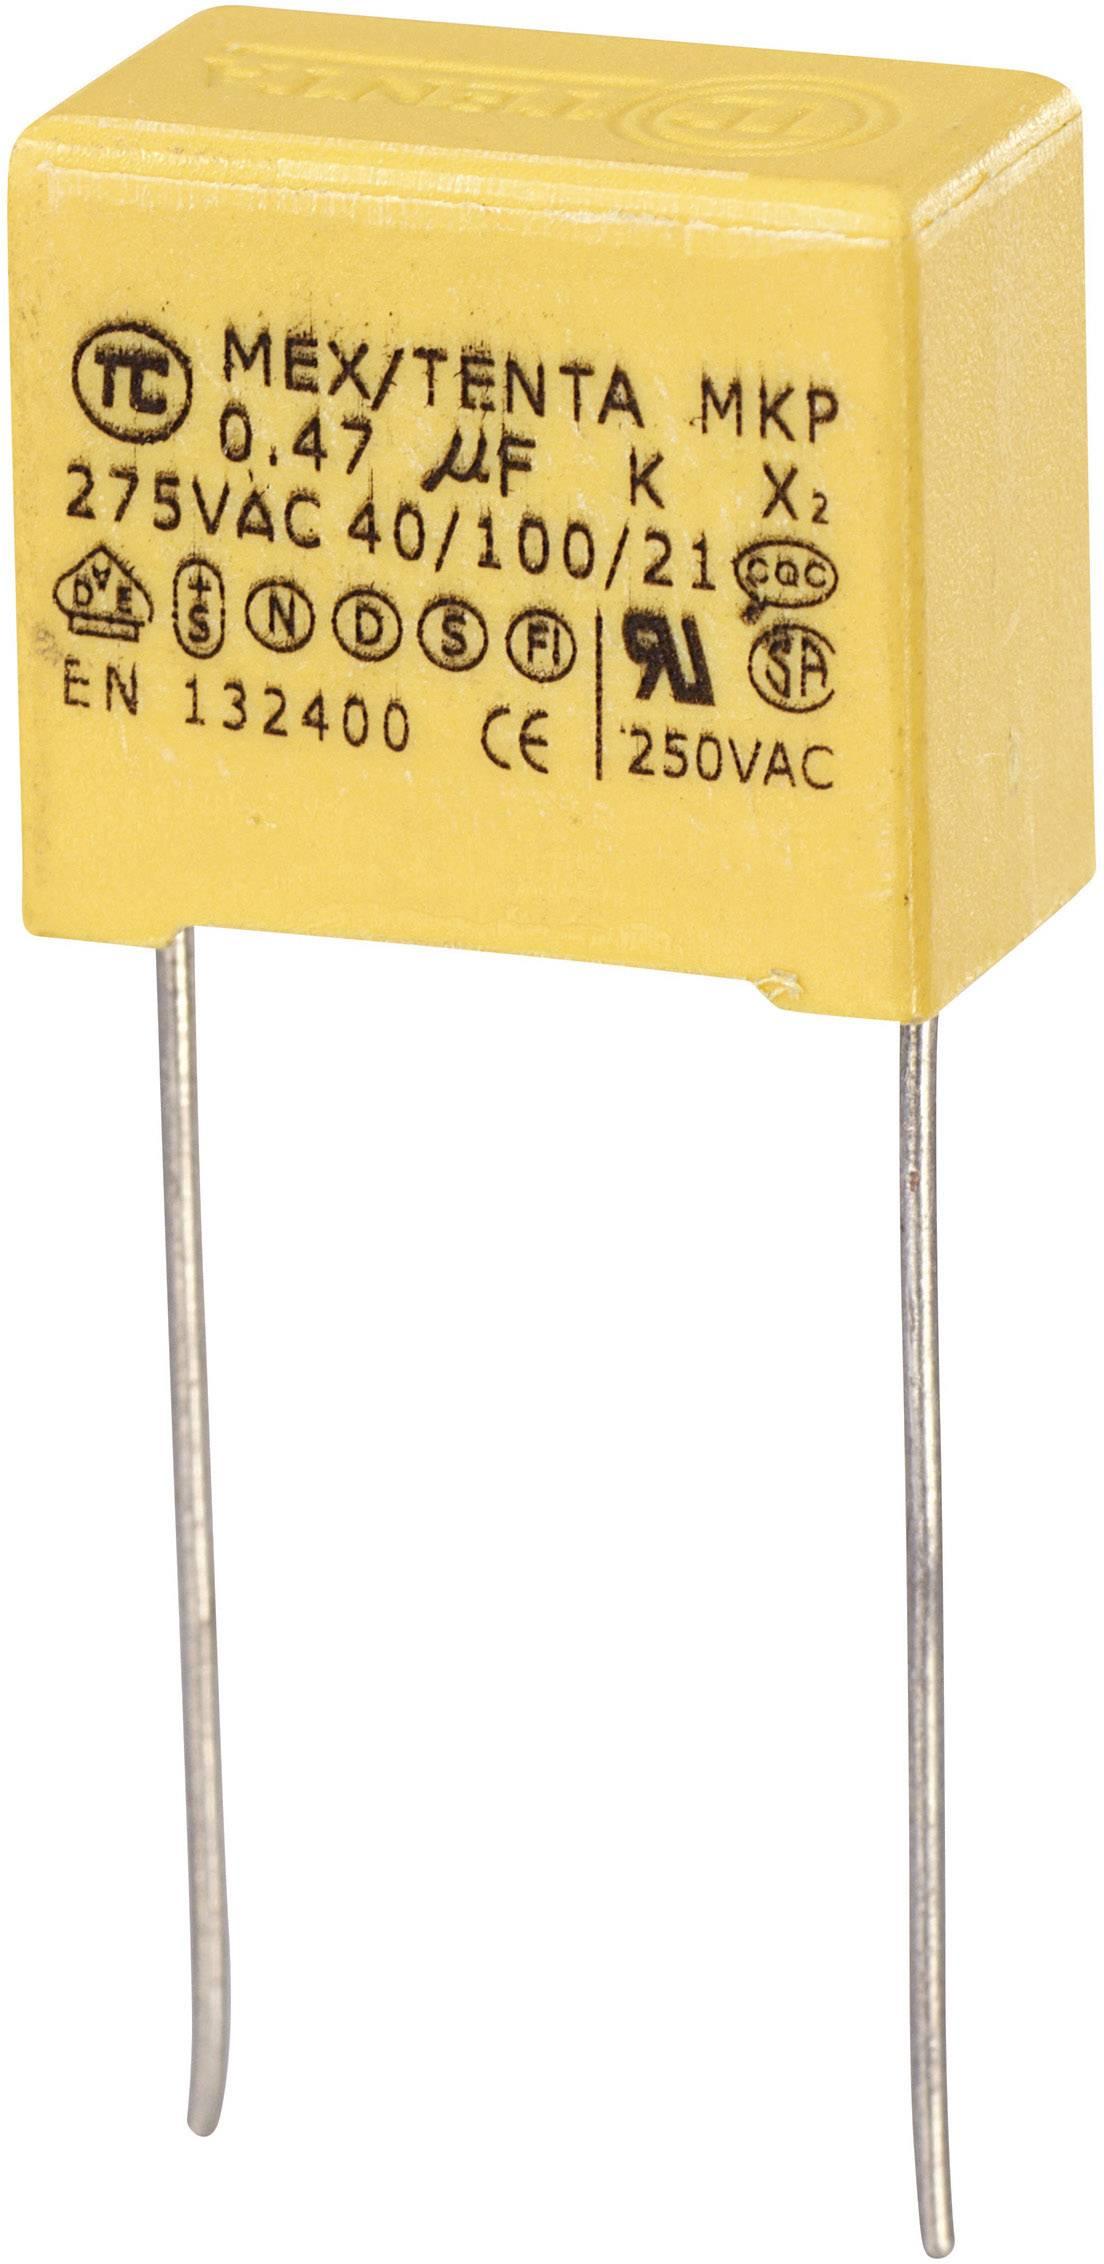 Foliový kondenzátor MKP, 0,47 µF, X2 275 V/AC, 10 %, 18 x 10 x 16 mm